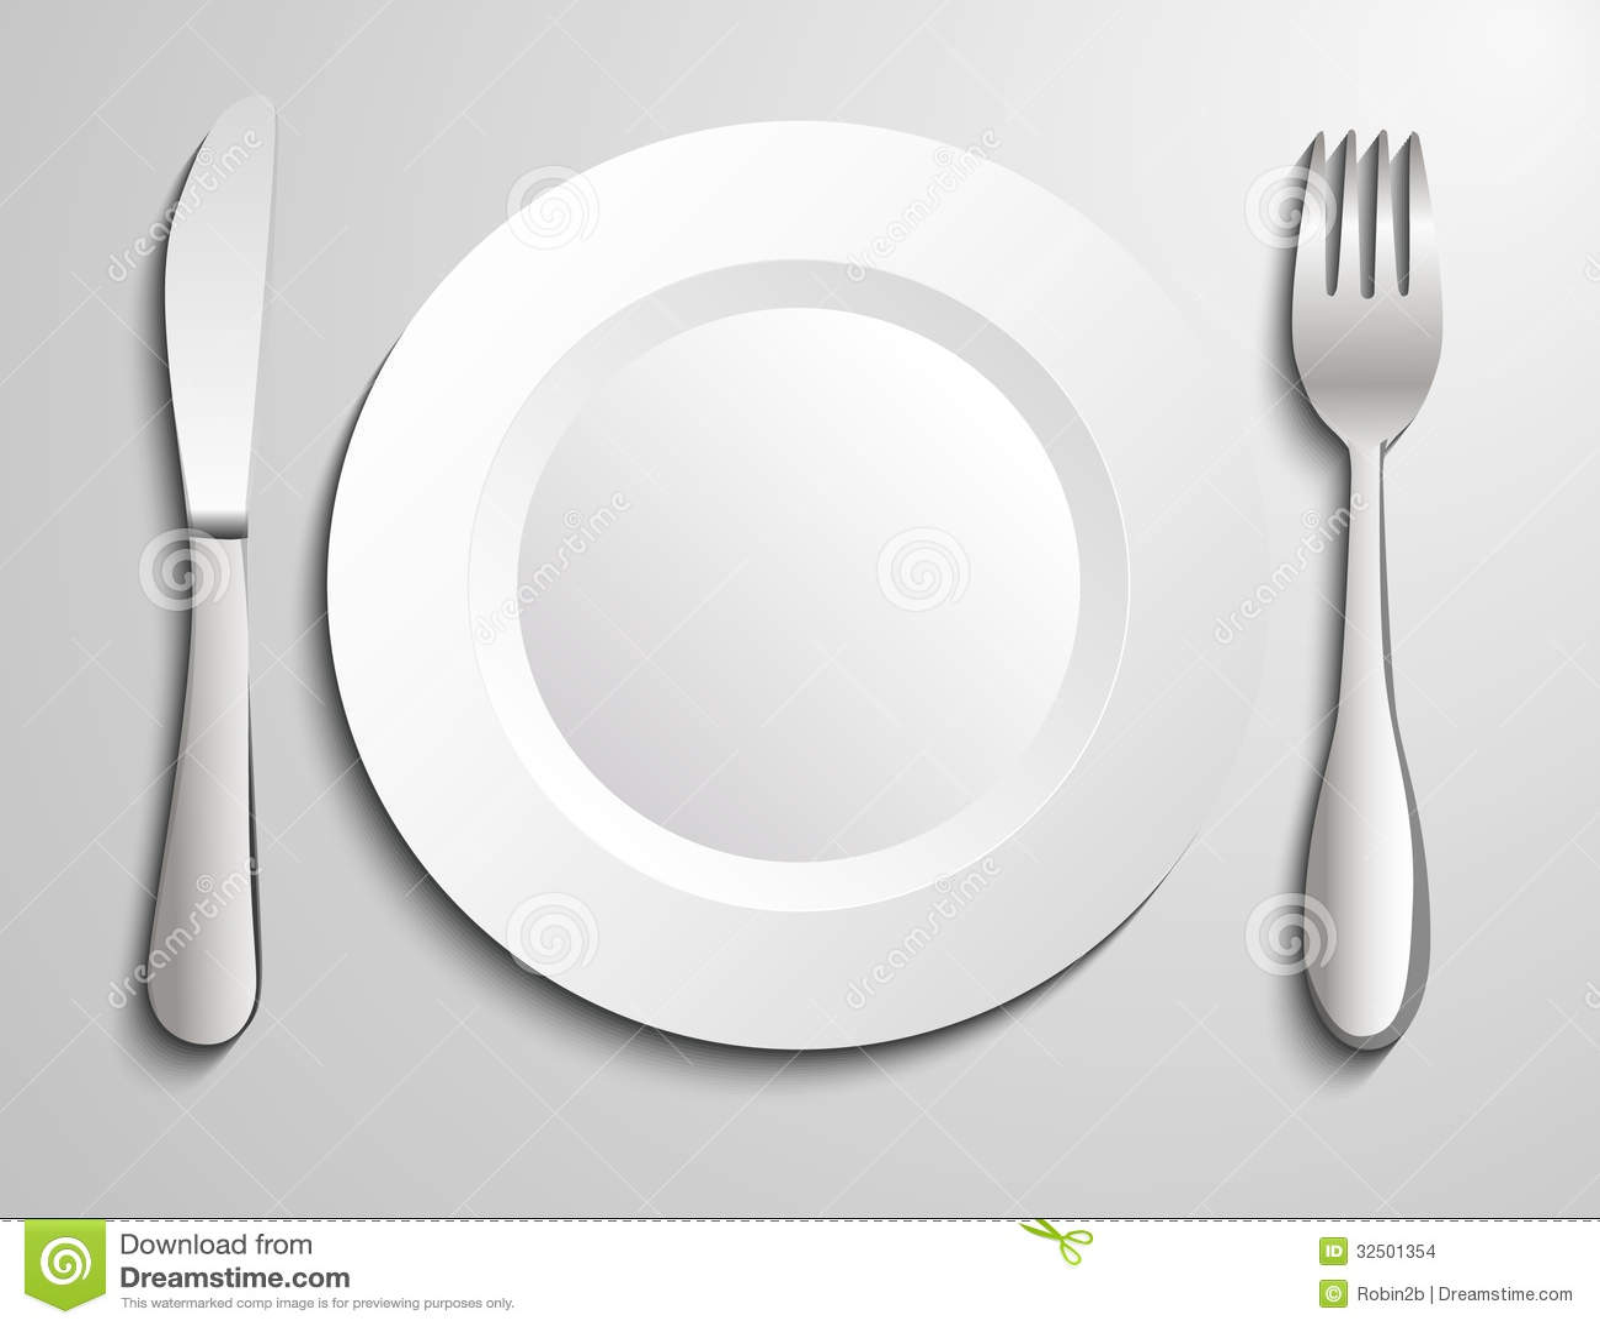 Plate Knife And Fork Stock Images Image 32501354 : plate knife fork illustration background 32501354 from www.dreamstime.com size 1300 x 1095 jpeg 60kB